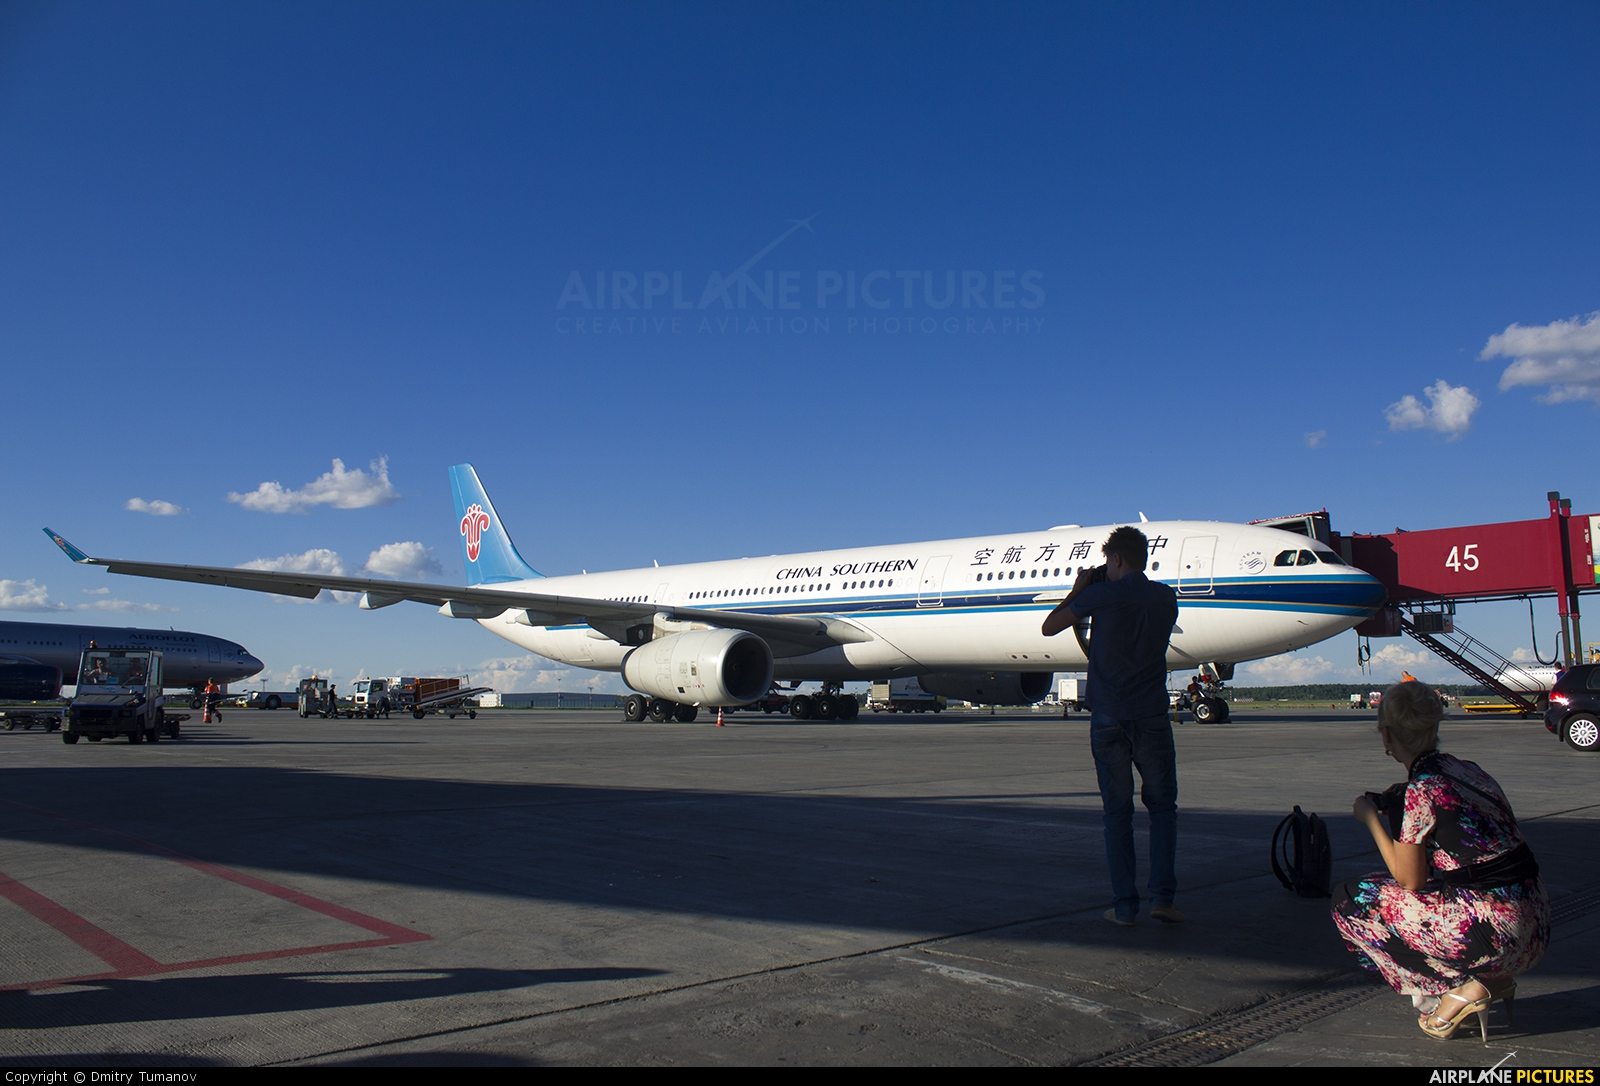 China Southern Airlines B-6111 aircraft at Moscow - Sheremetyevo